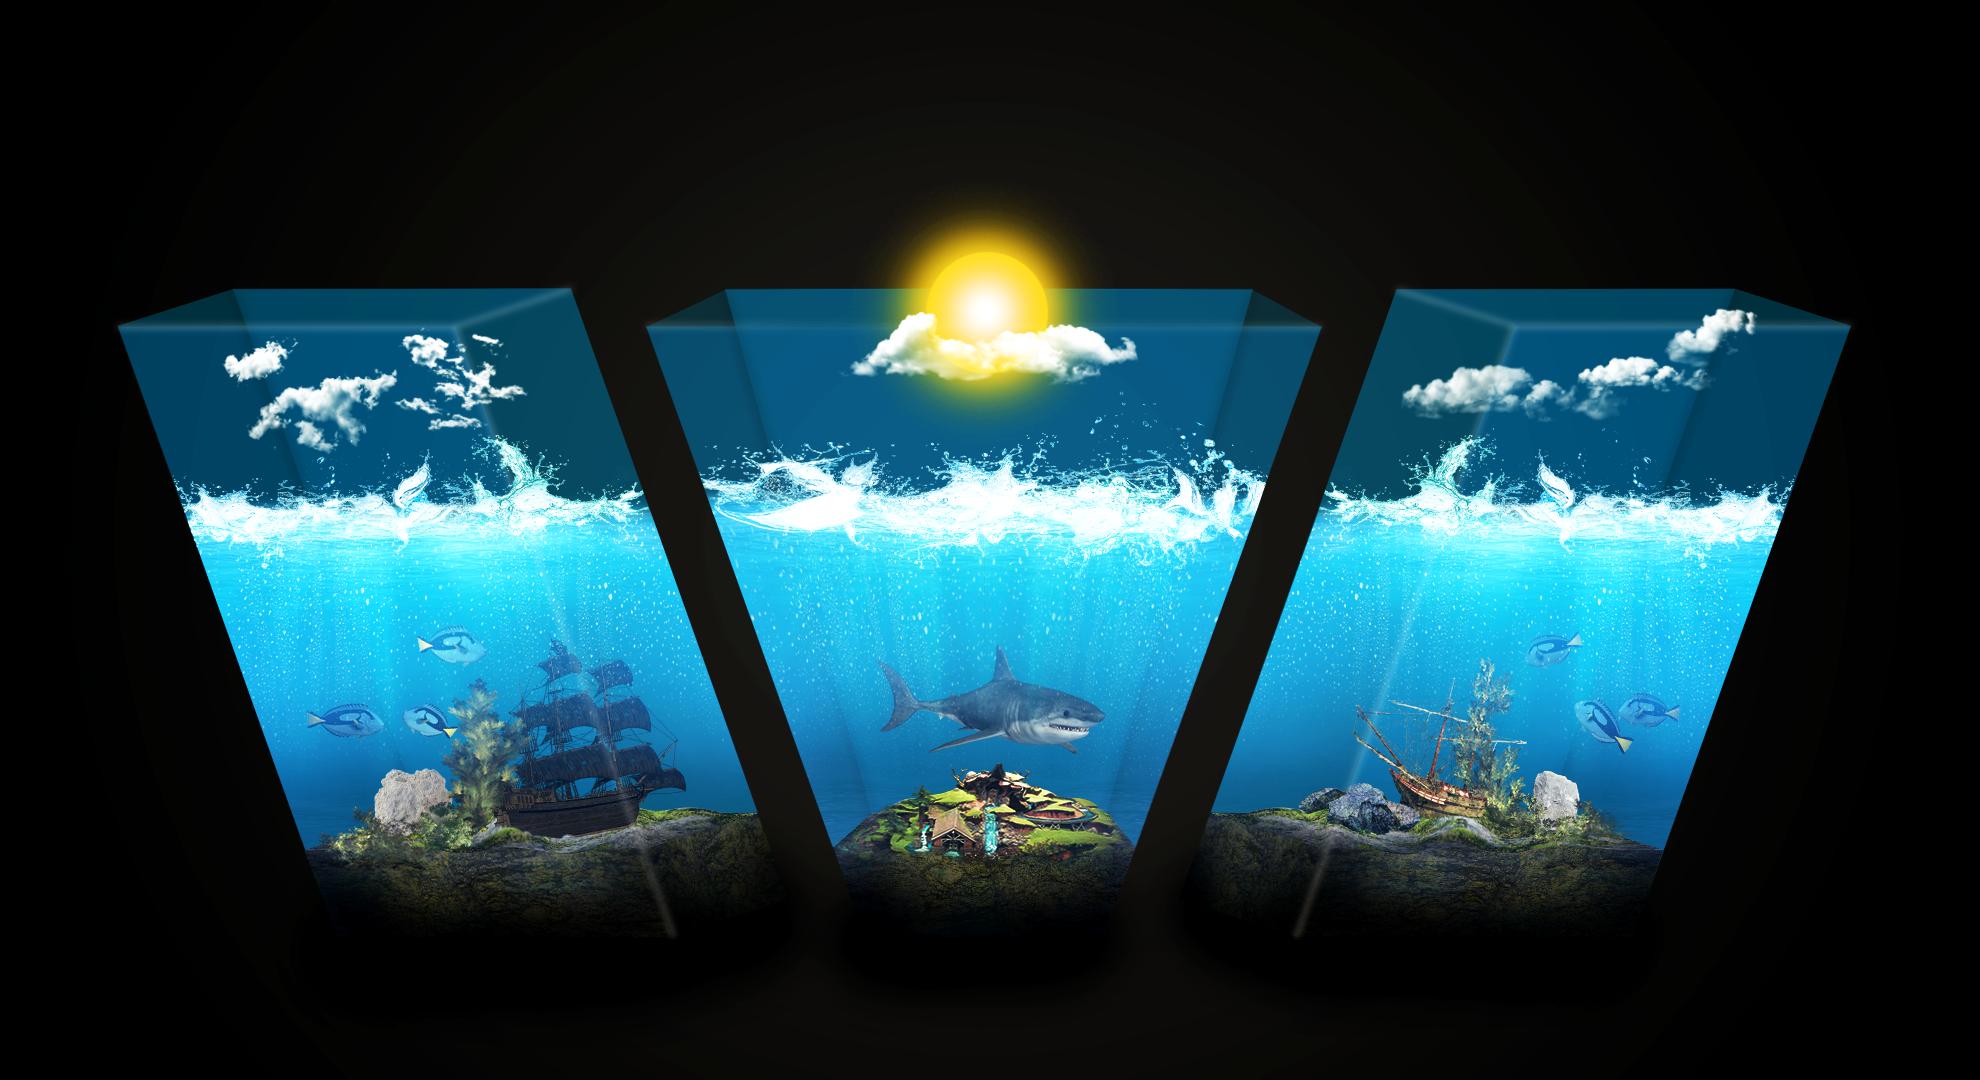 Aquarium by Bawzon